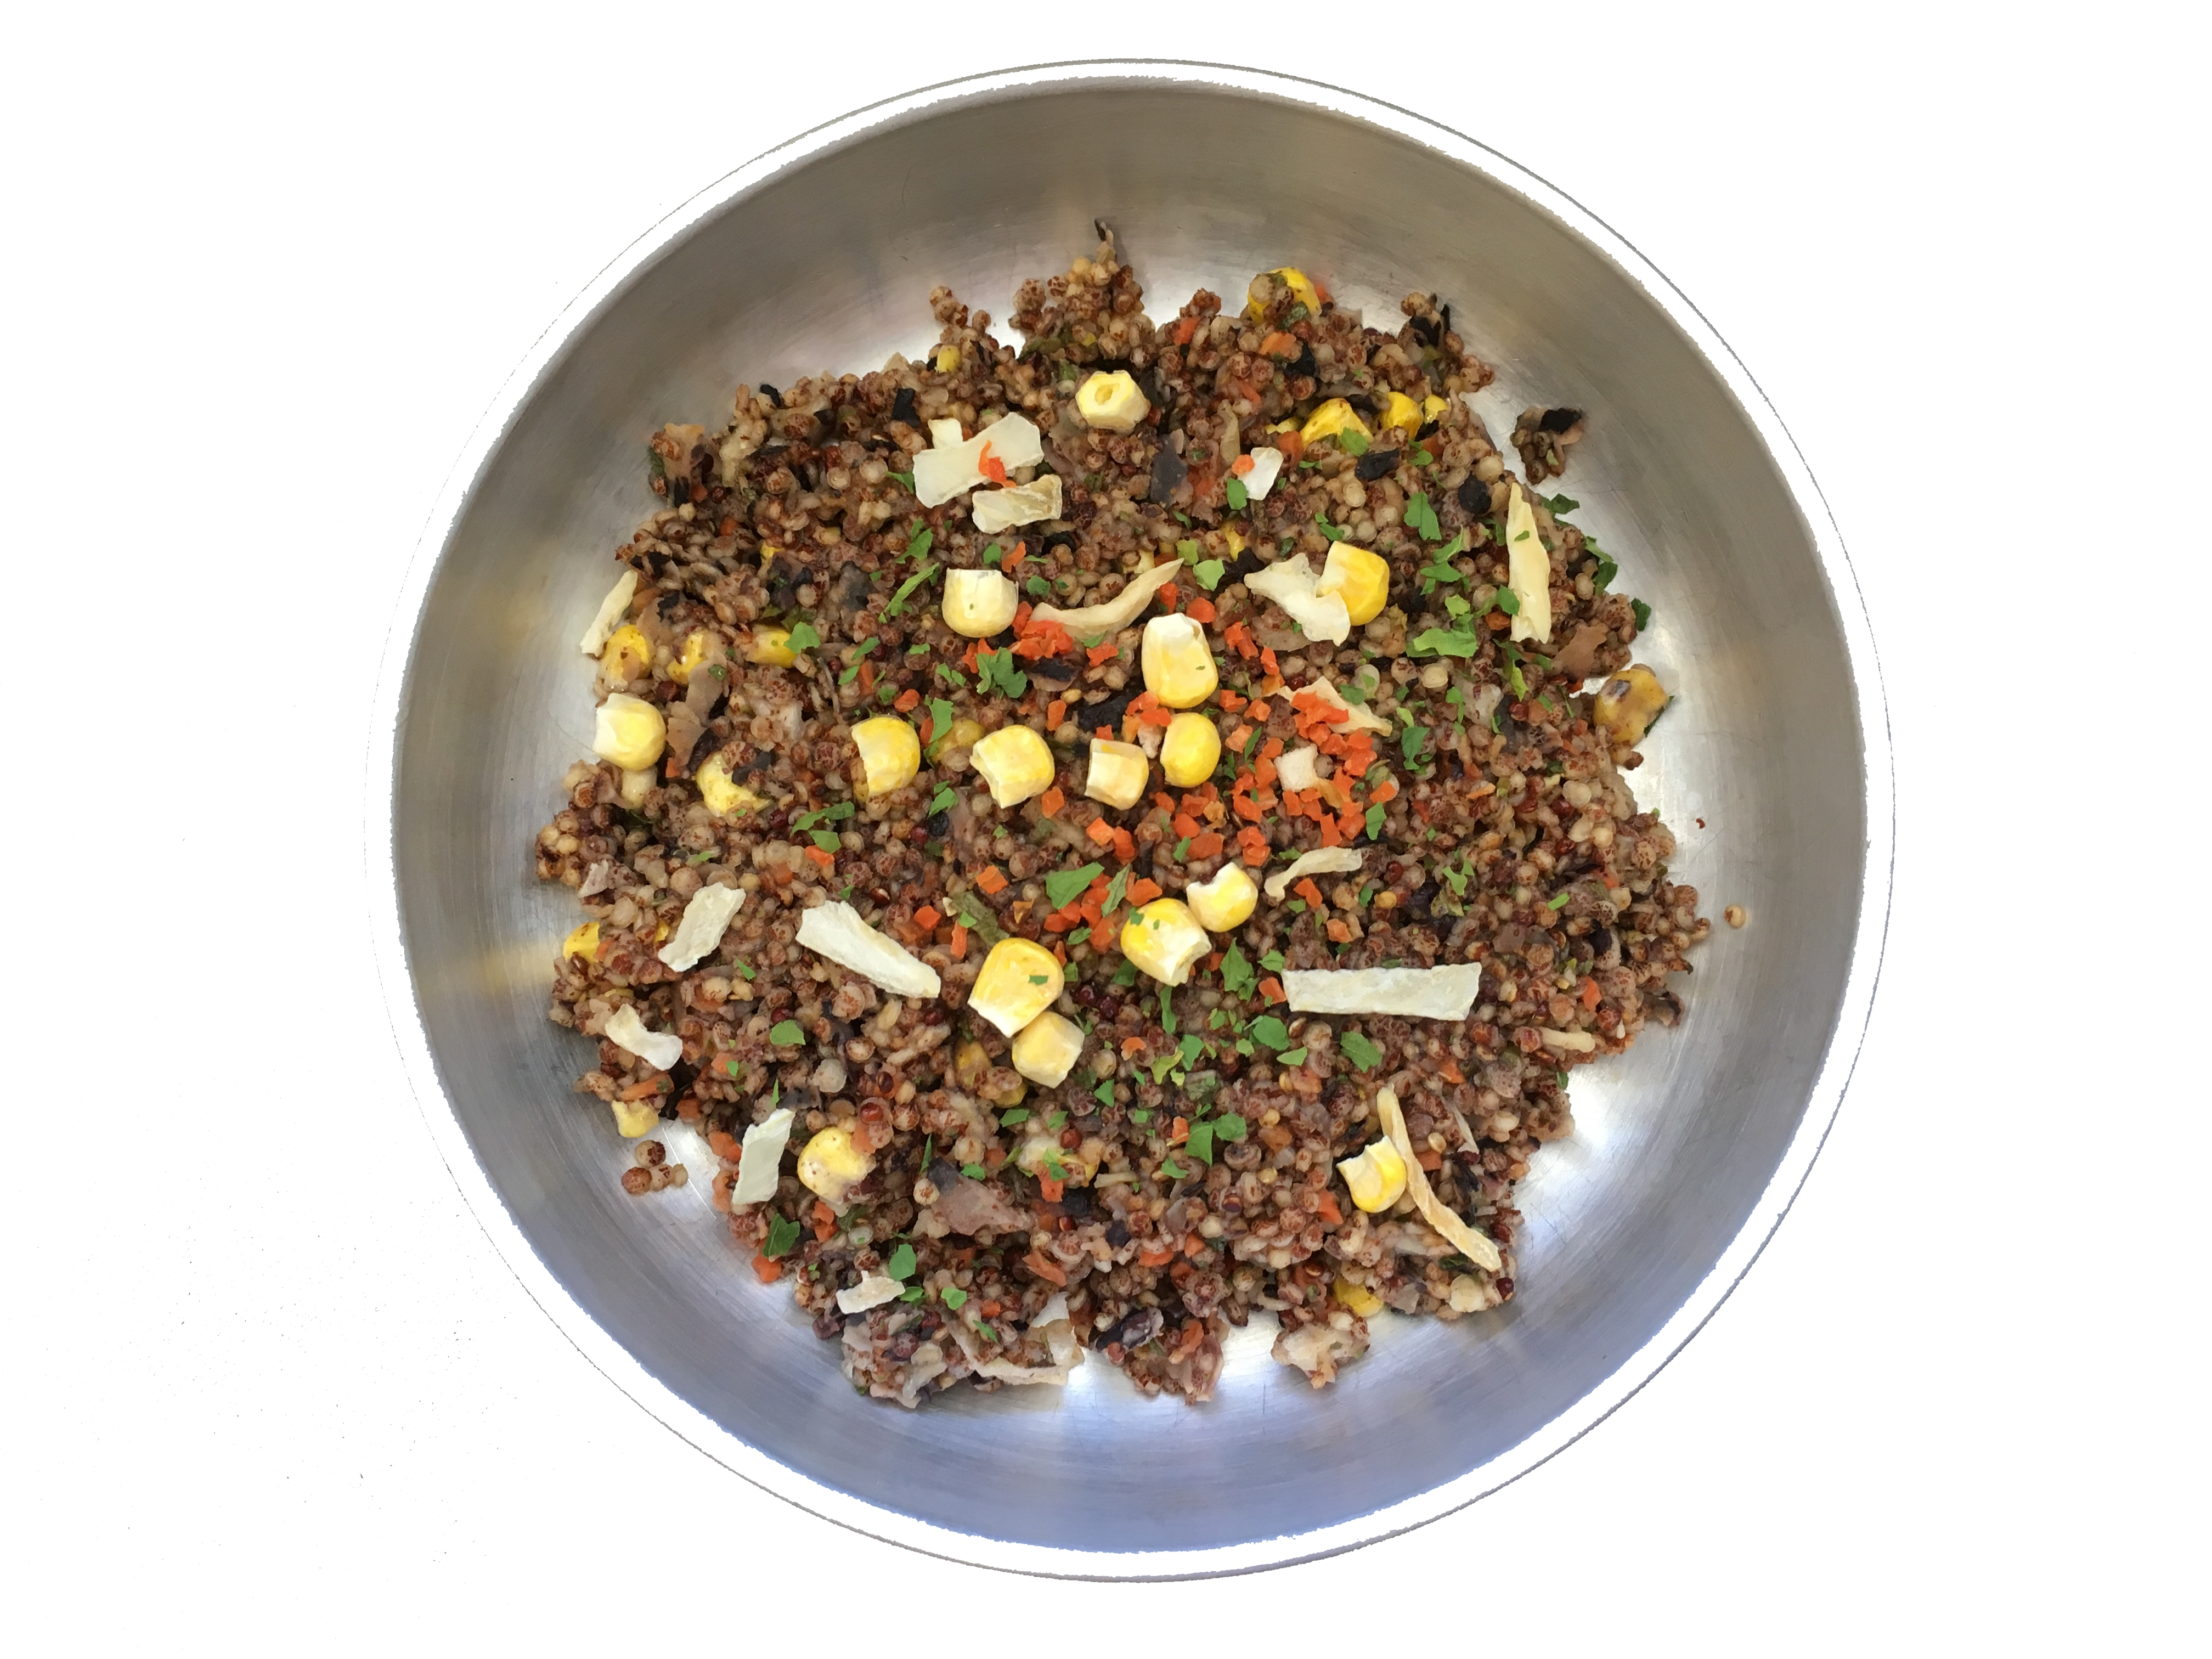 blackened-quinoa-salad-top-view.jpg